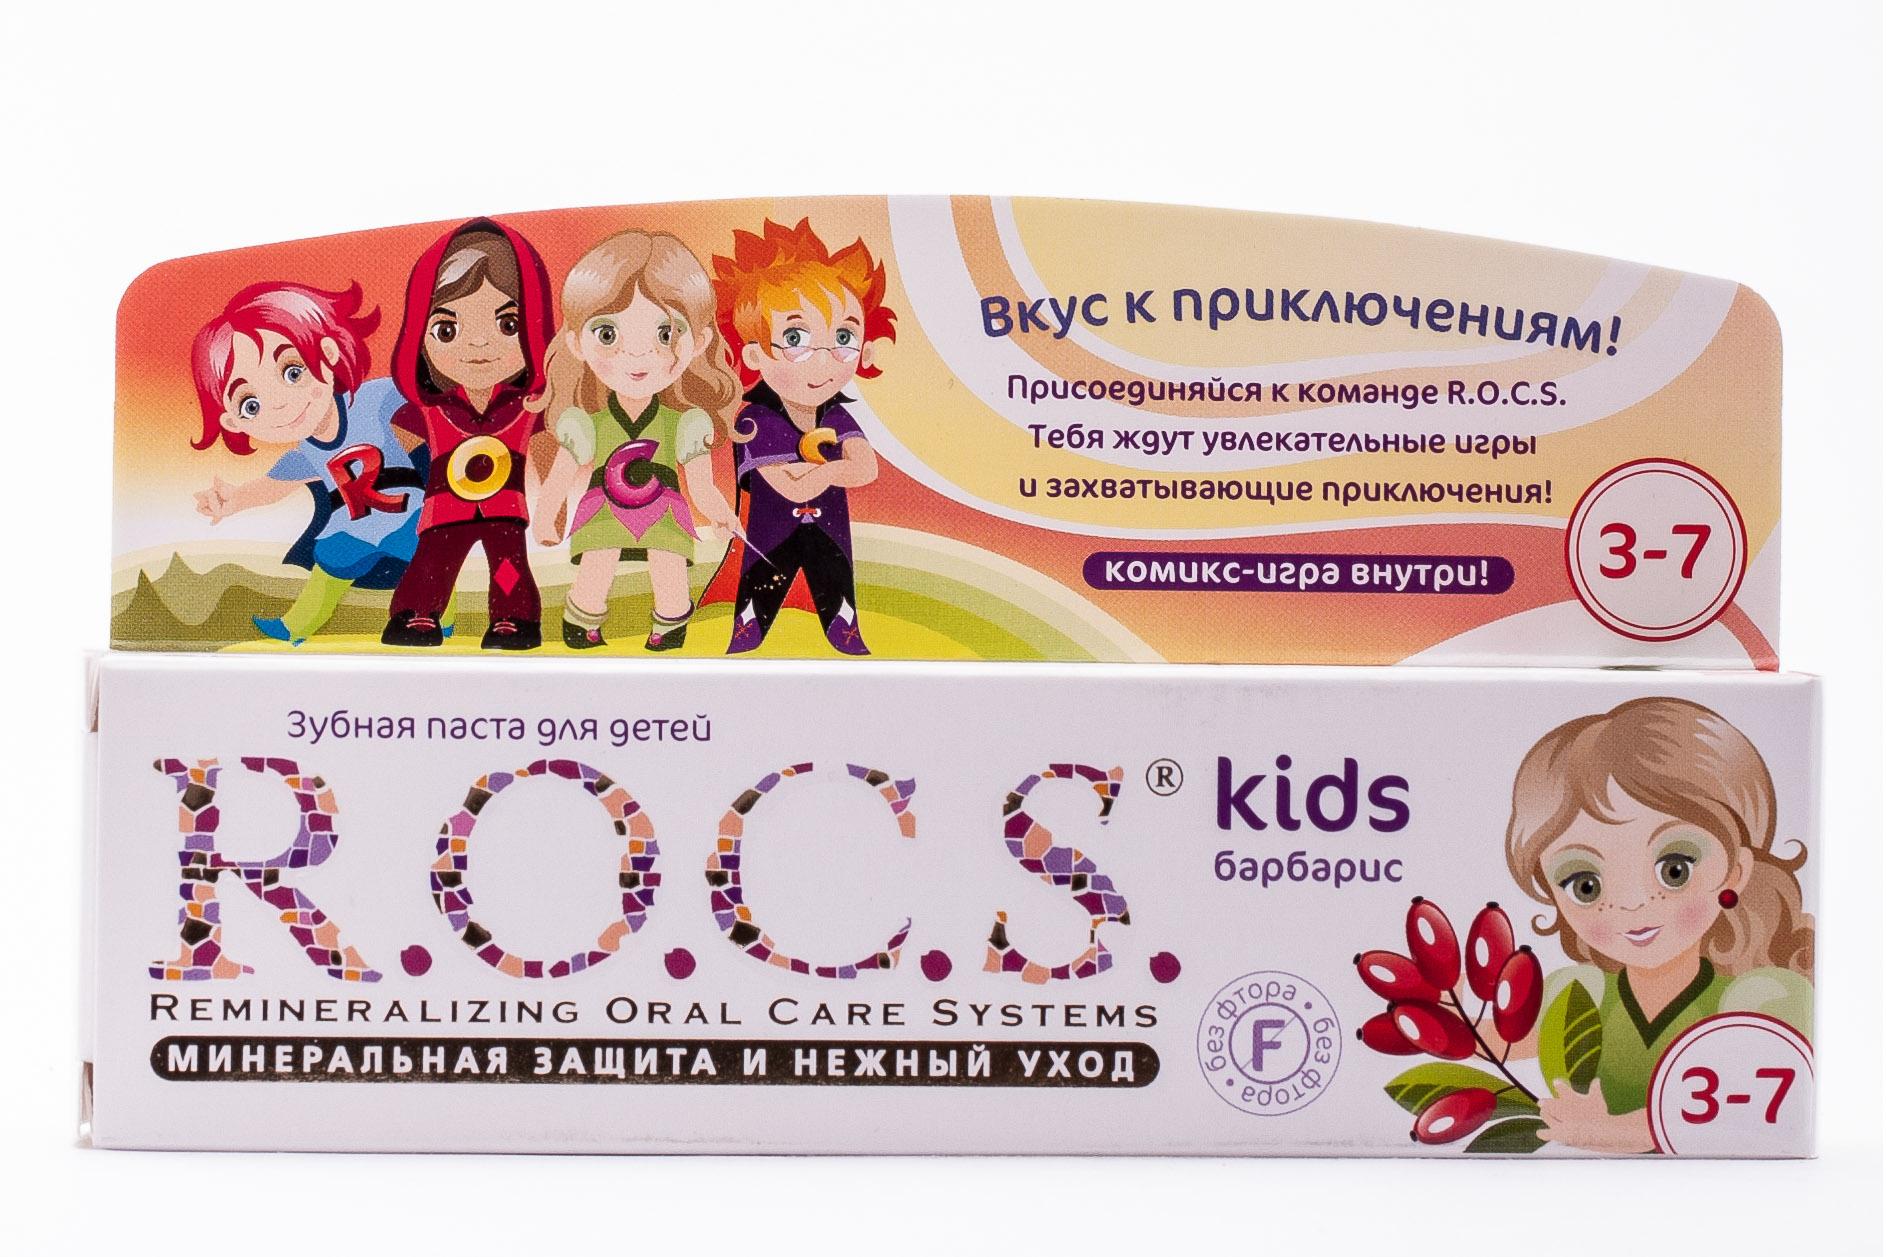 Зубная паста Рокс для детей Барбарис со вкусом барбариса 45 гр. (Kids 3-7 years) (R.O.C.S)